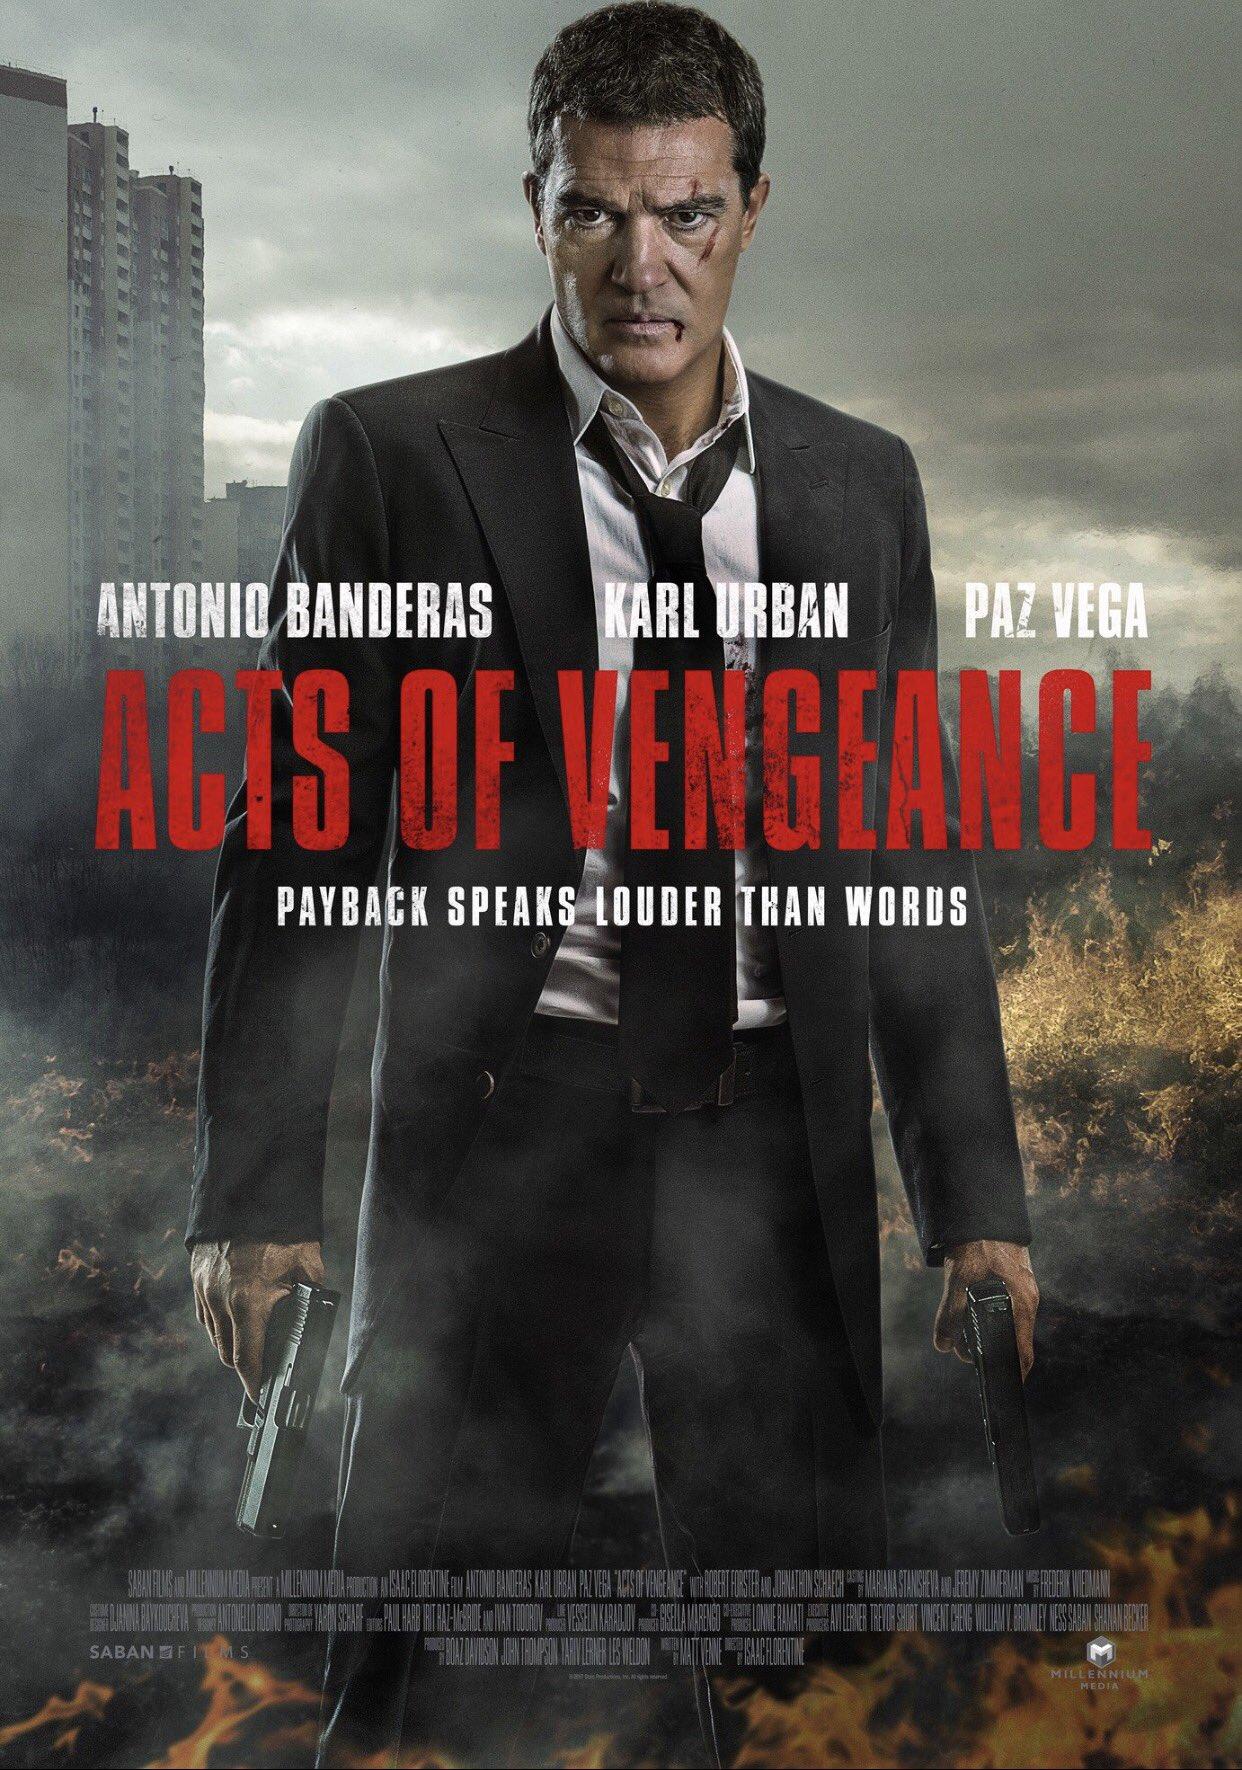 Shurisdzieba Qartulad / შურისძიება (ქართულად) / Acts of Vengeance